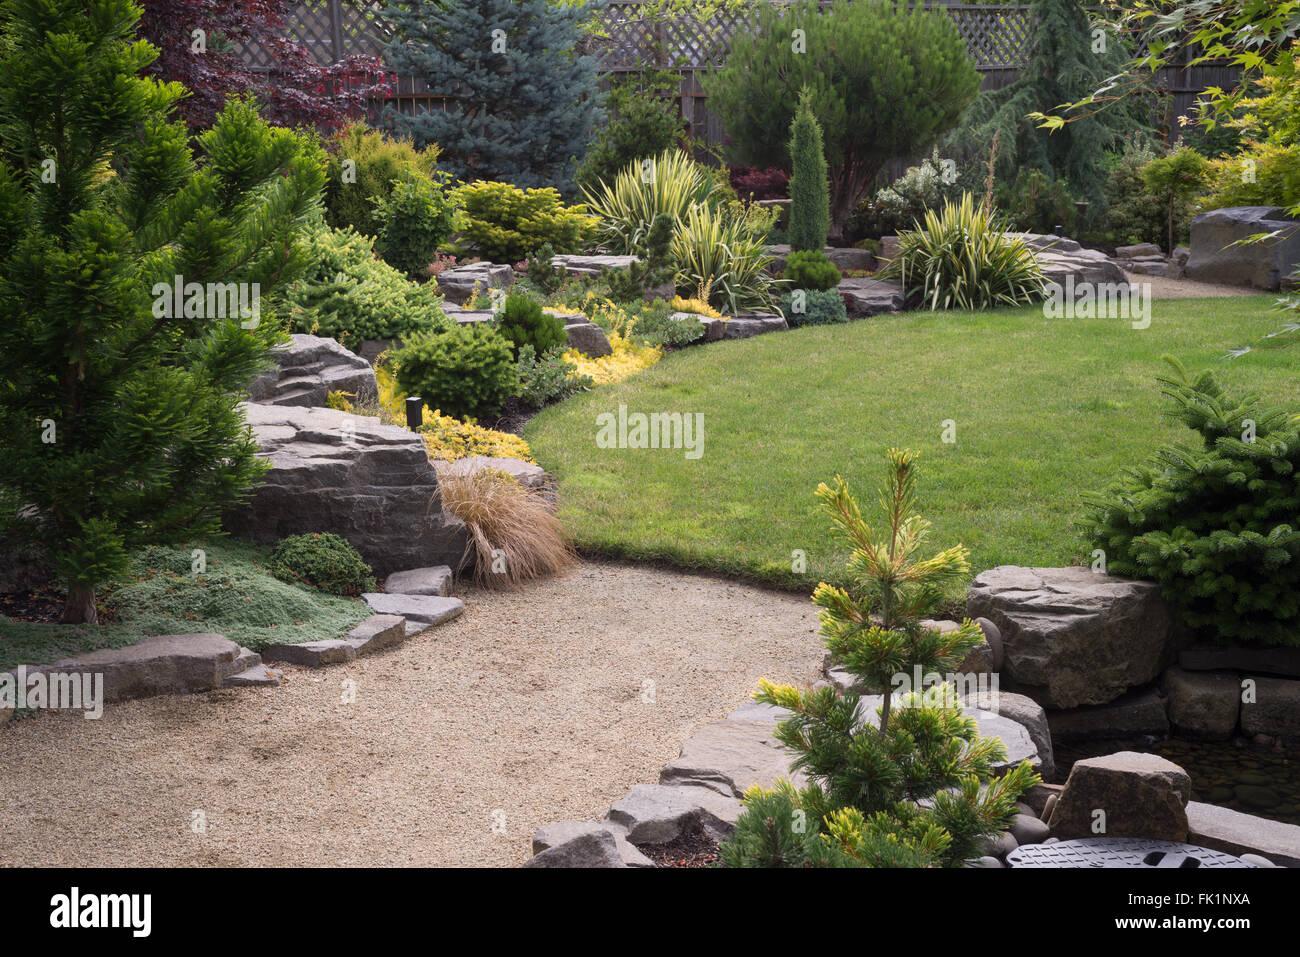 Sand Backyard a sand pebbled path leads to a lush green backyard lawn featuring